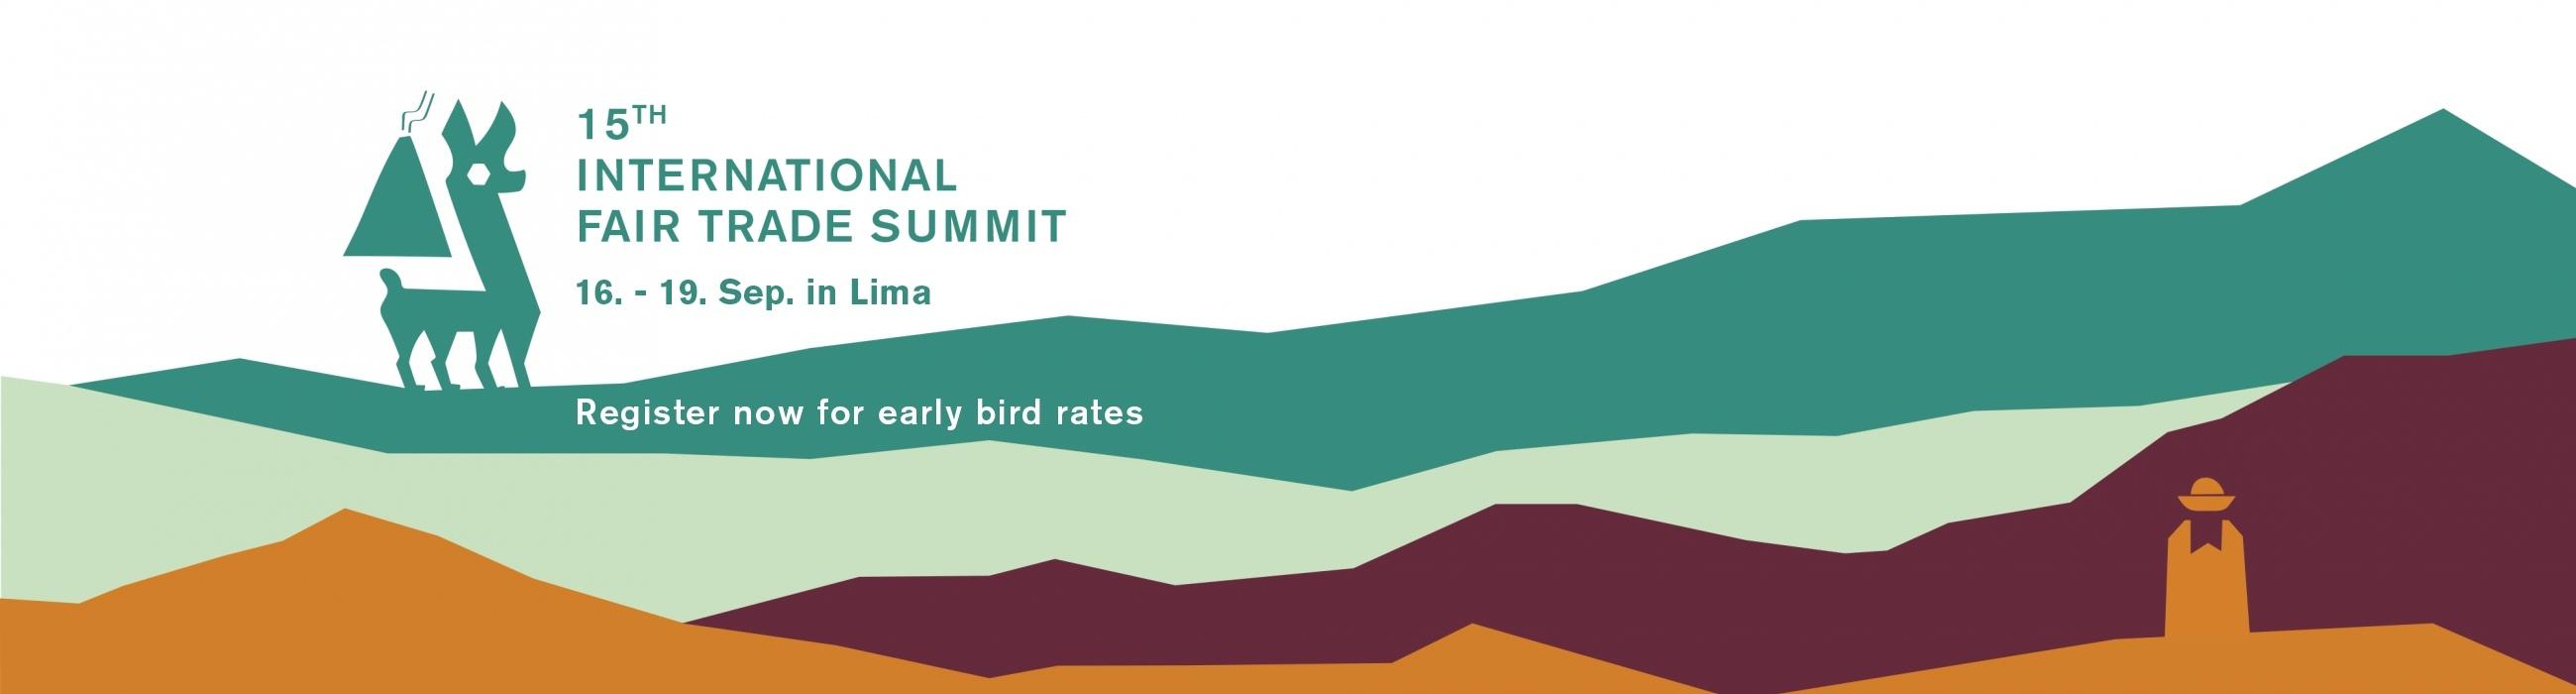 International Fair Trade Summit, Lima, Peru